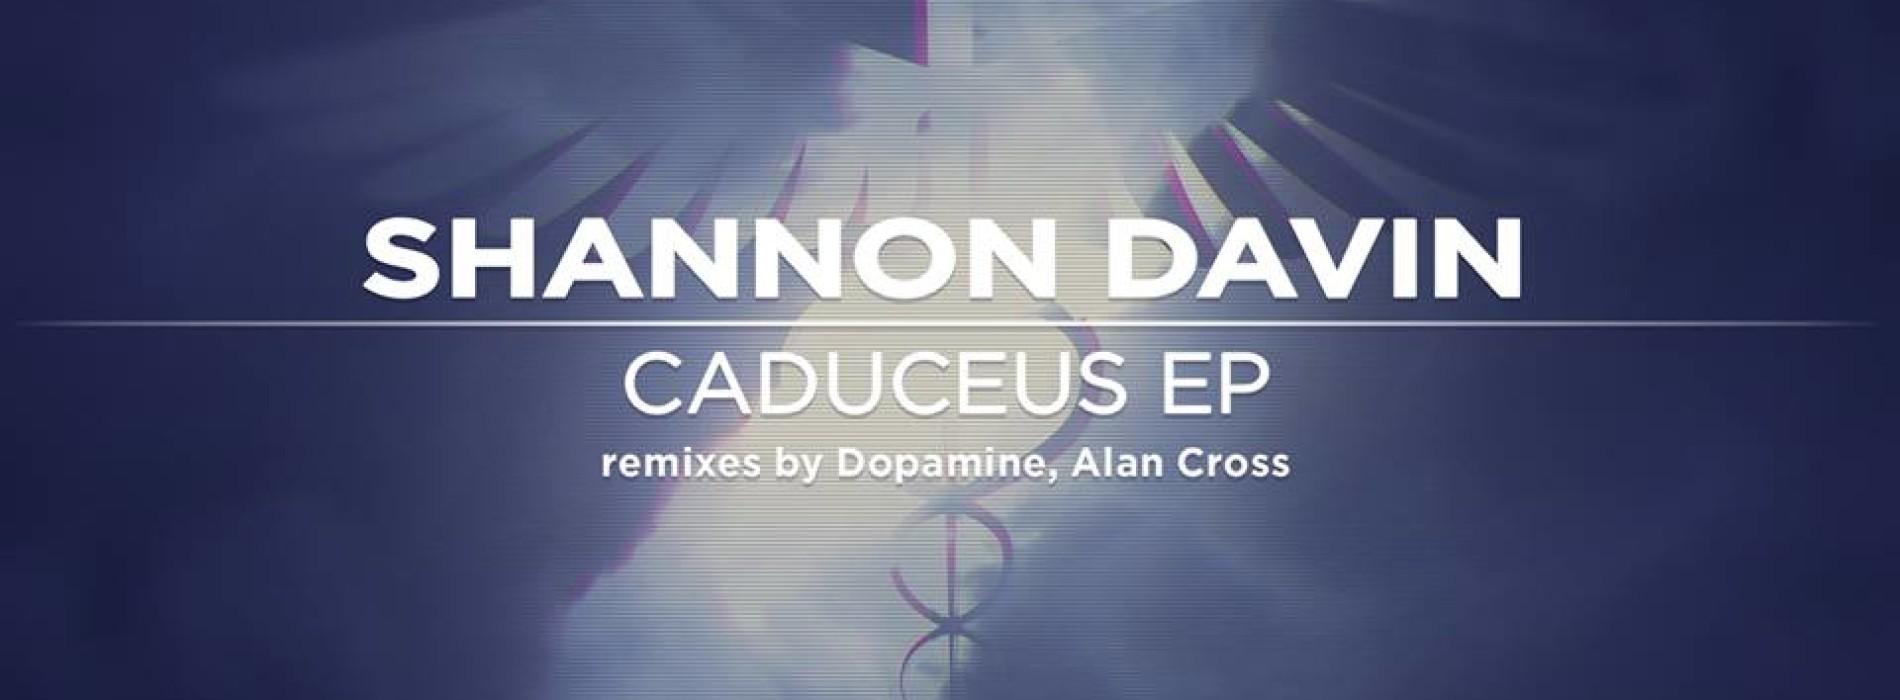 Shannon Davin : Caduceus (EP)